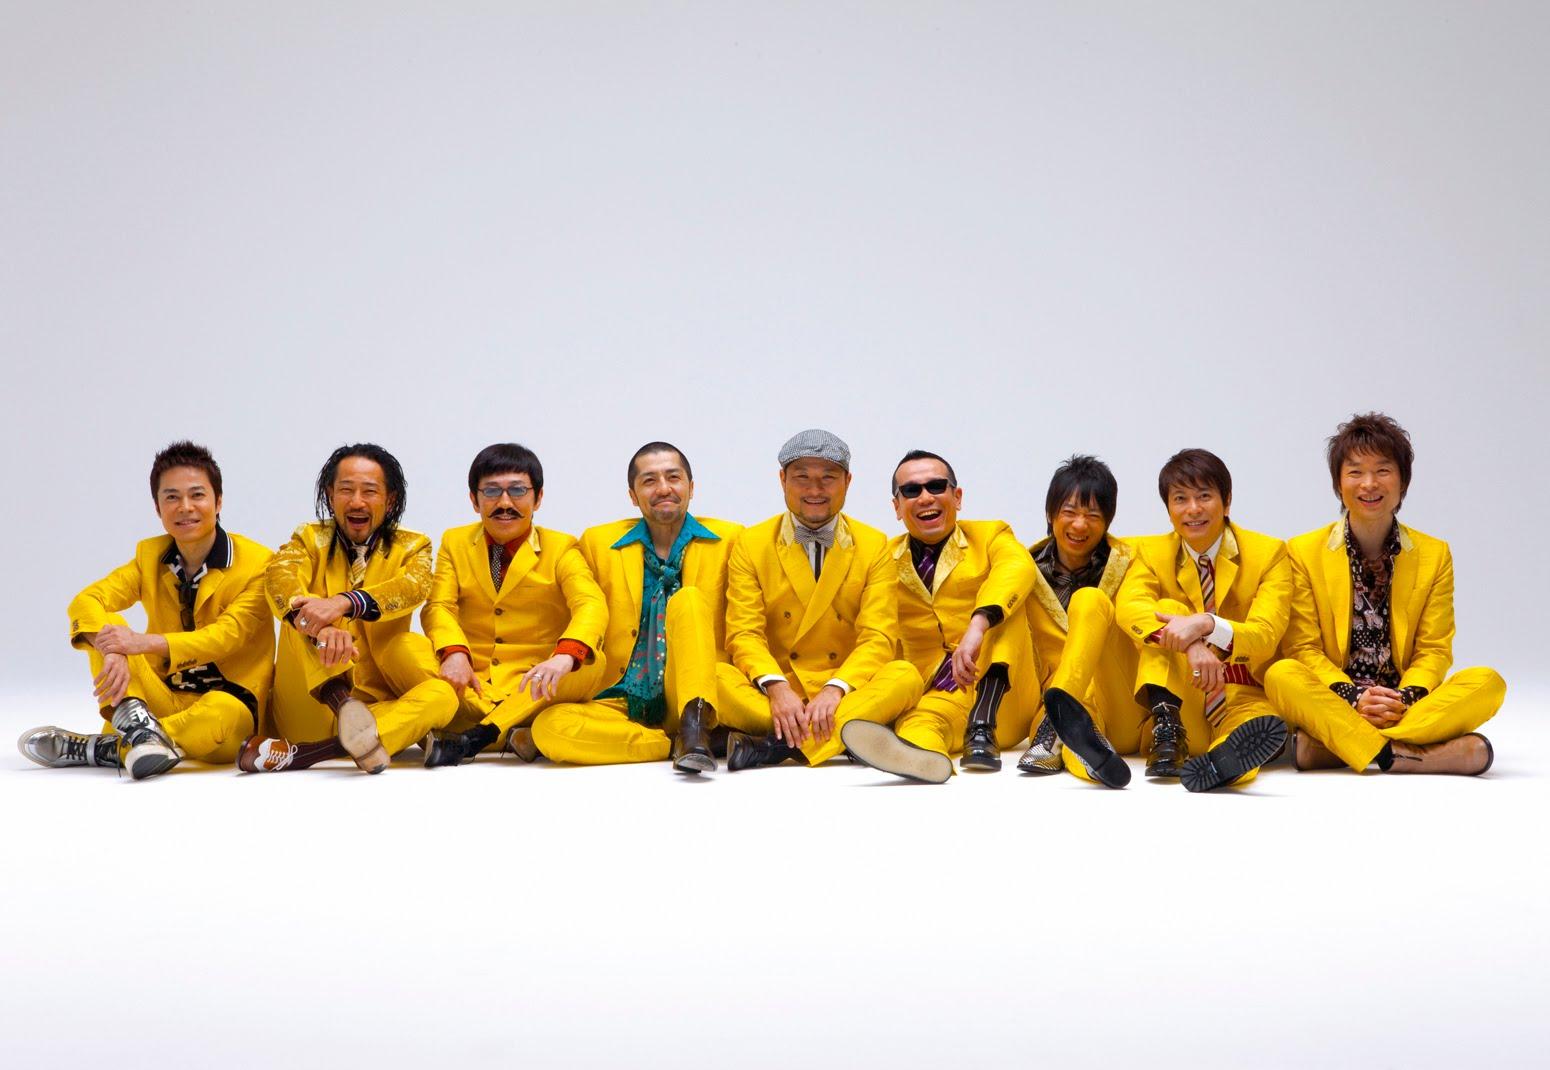 http://1.bp.blogspot.com/-QIFXAtm3I84/T1Y6vQyGRZI/AAAAAAAAASo/wh85KKGzARk/s1600/tokyo+ska+paradise+orchestra+live+2010.jpg